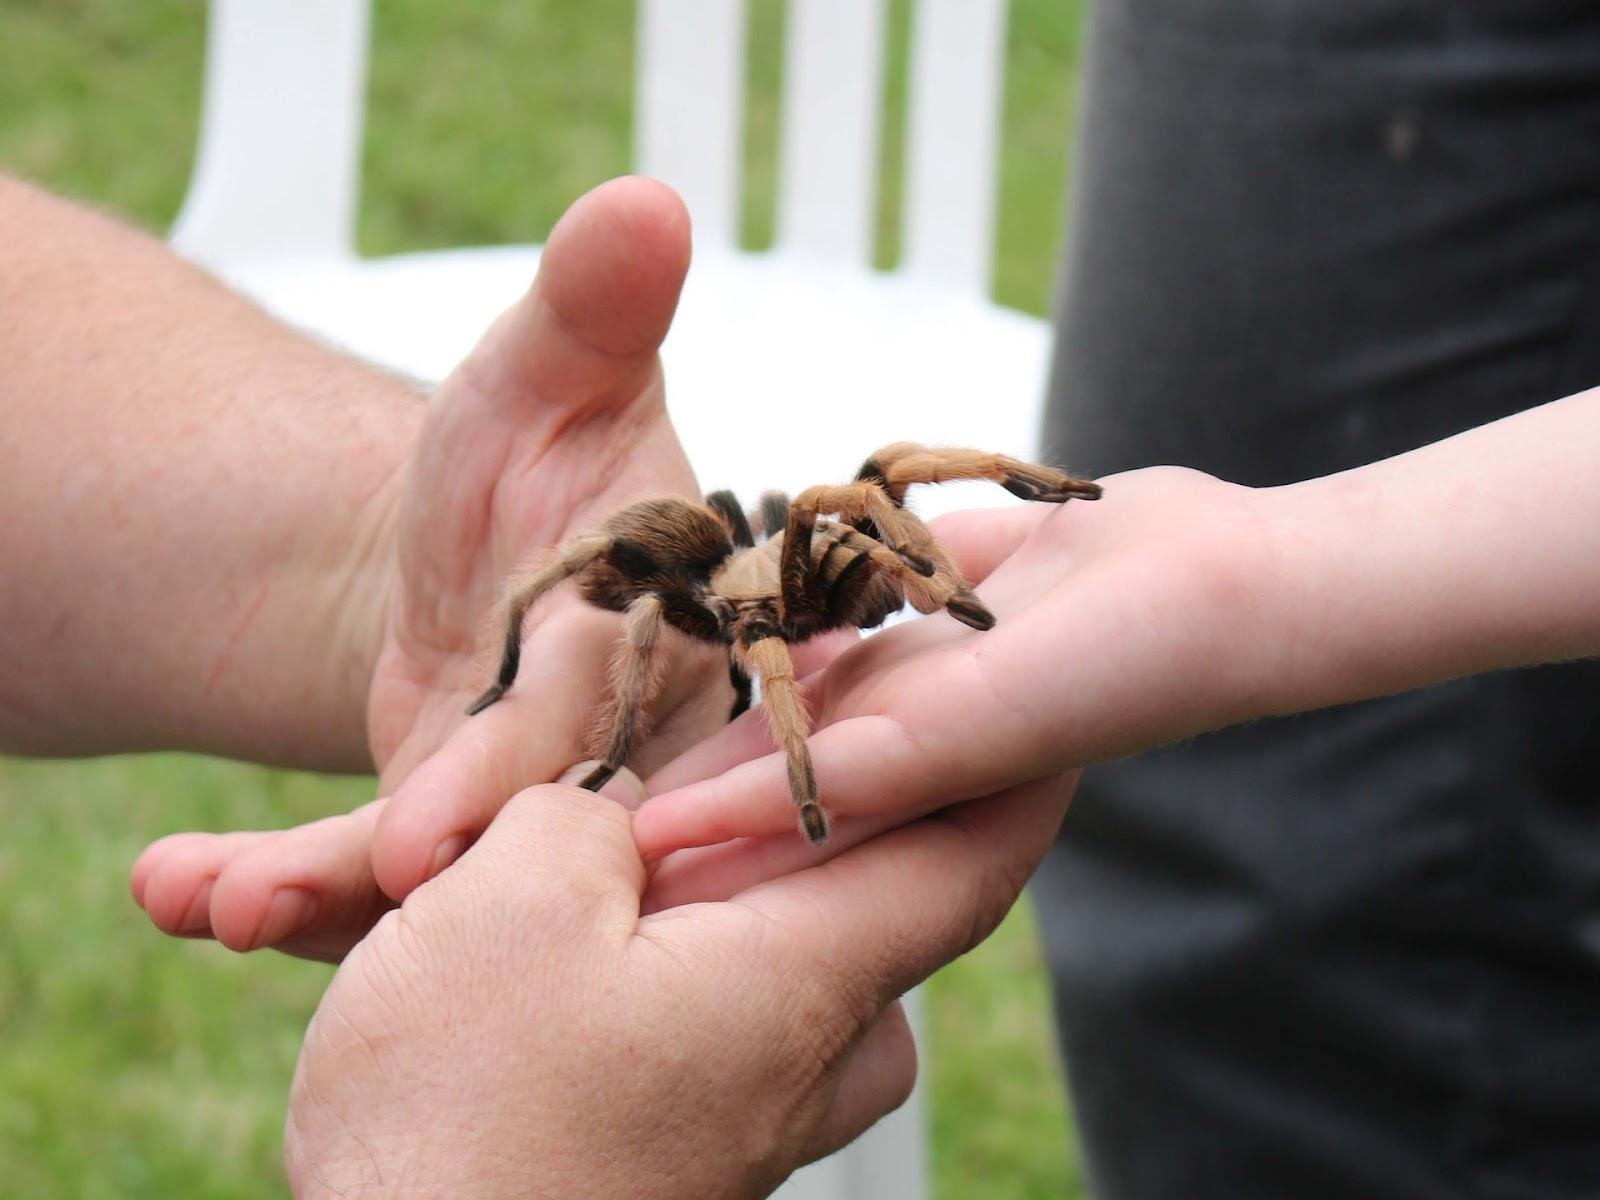 Adult handing tarantula to child